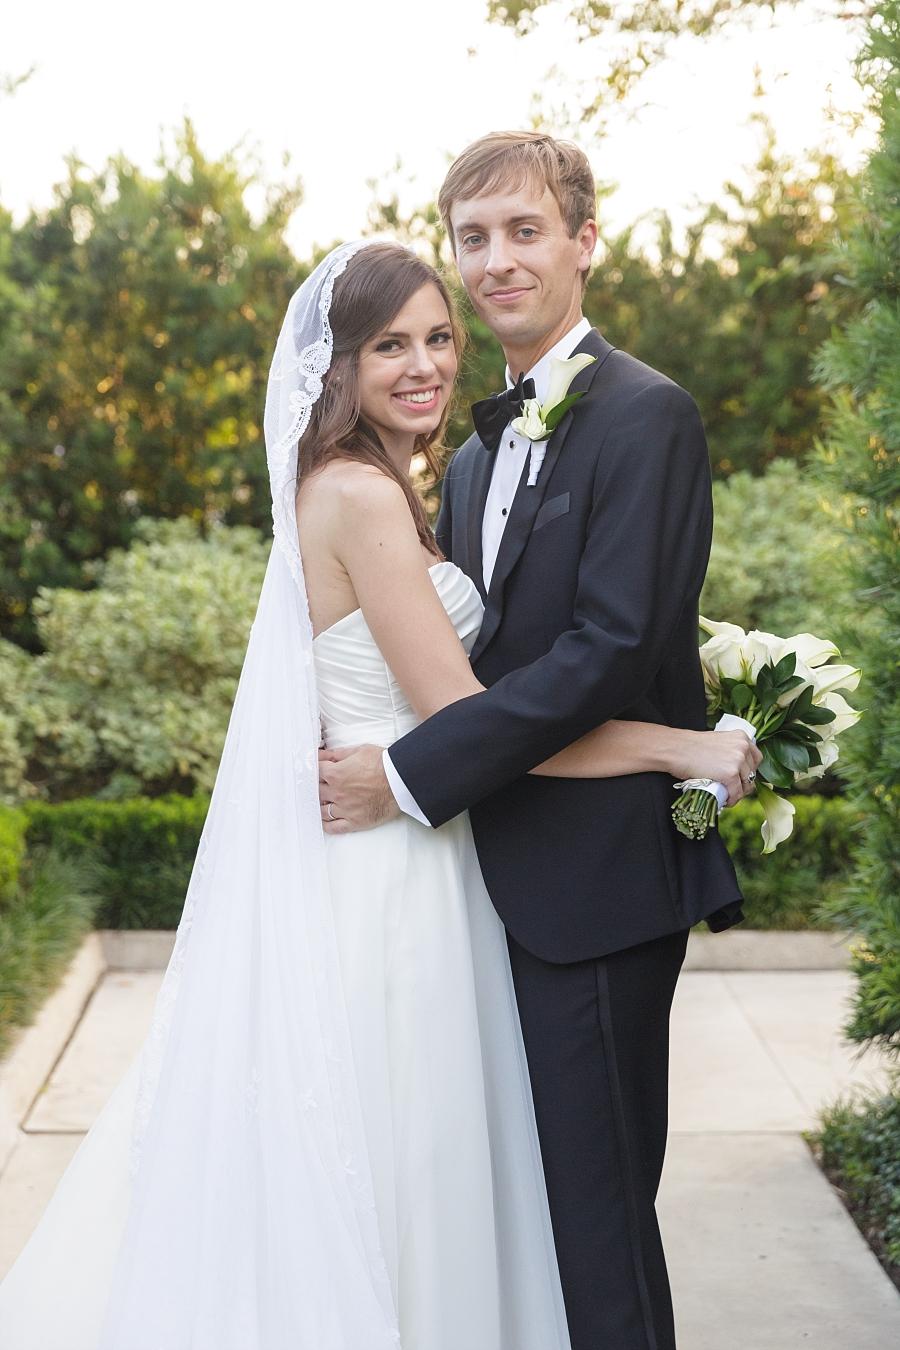 Stacy-Anderson-Photography-McGovern-Centennial-Gardens-Houston-Wedding-Photographer_0057.jpg